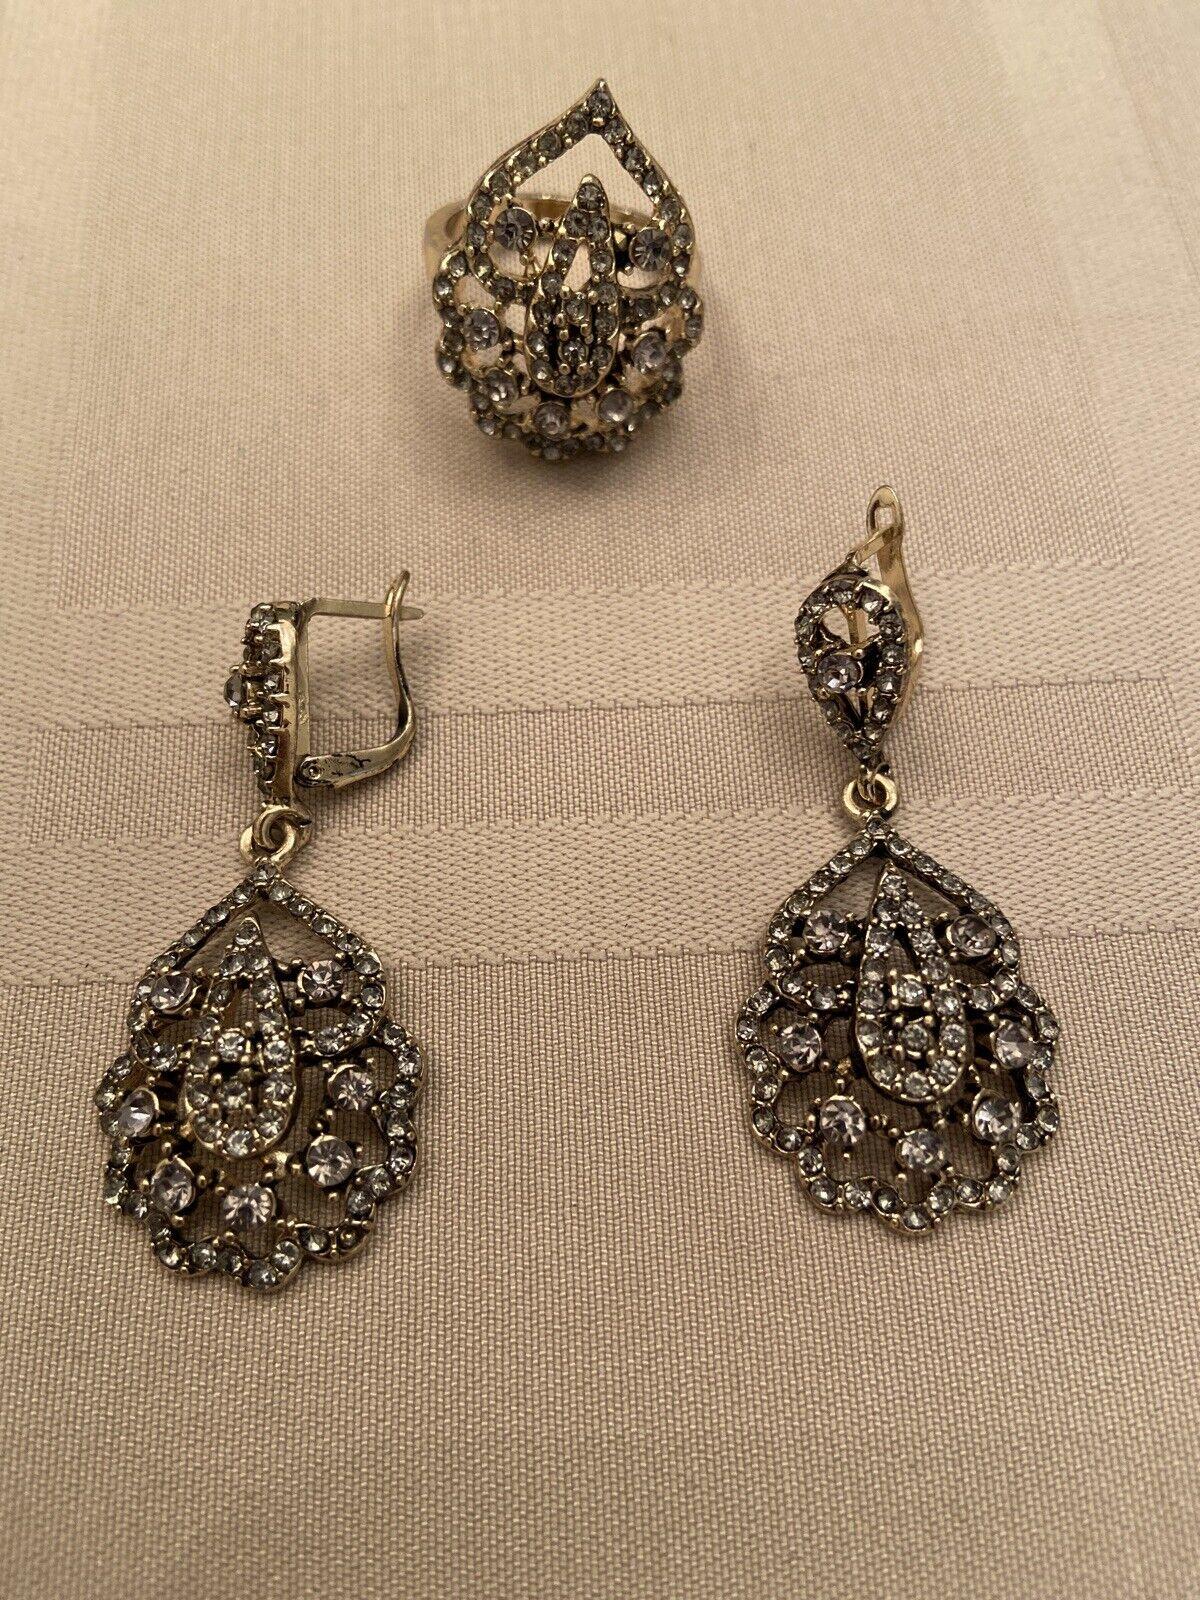 Gift for Mom Antique Bronze Teardrop Golden Topaz Rhinestone Lever back Earrings Topaz Stone Vintage Jewelry Citrine Crystal Earrings